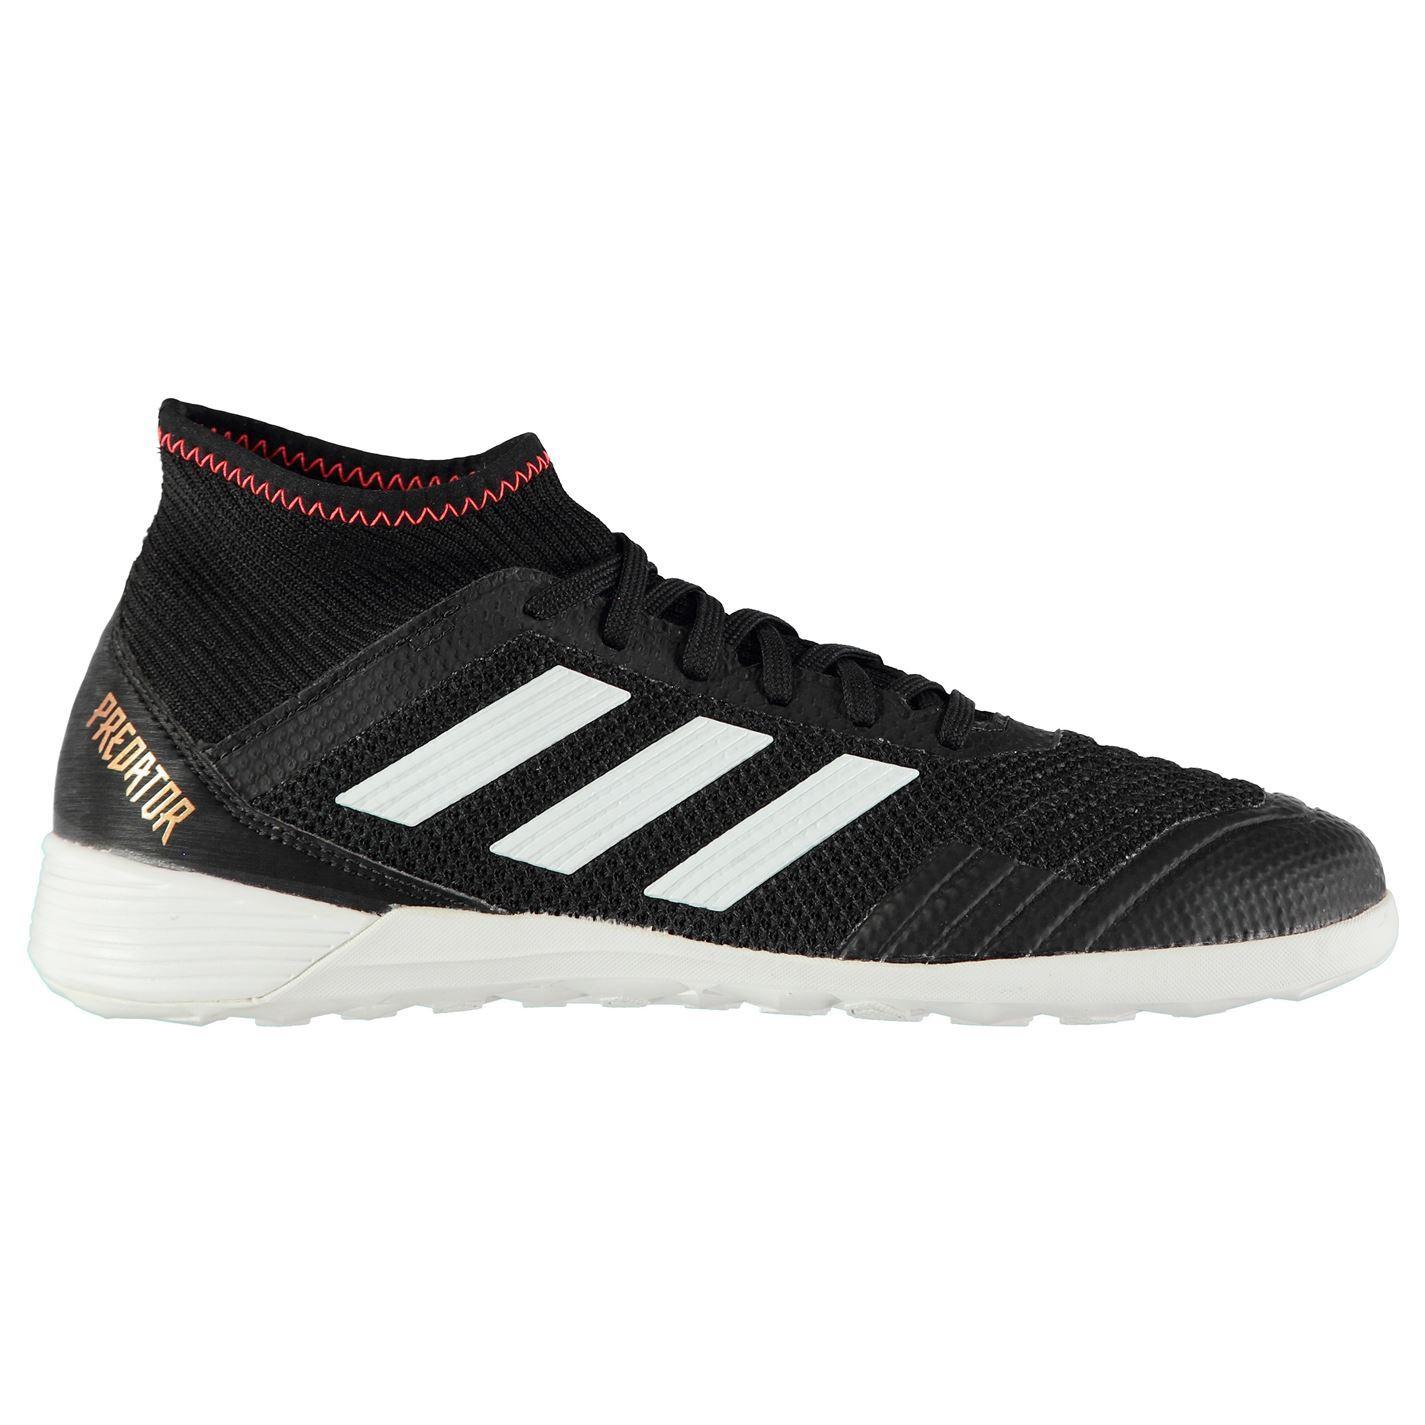 ba1cc94f adidas Mens Predator Tango 18.3 Indoor Football Trainers Boots Lace Up Mesh